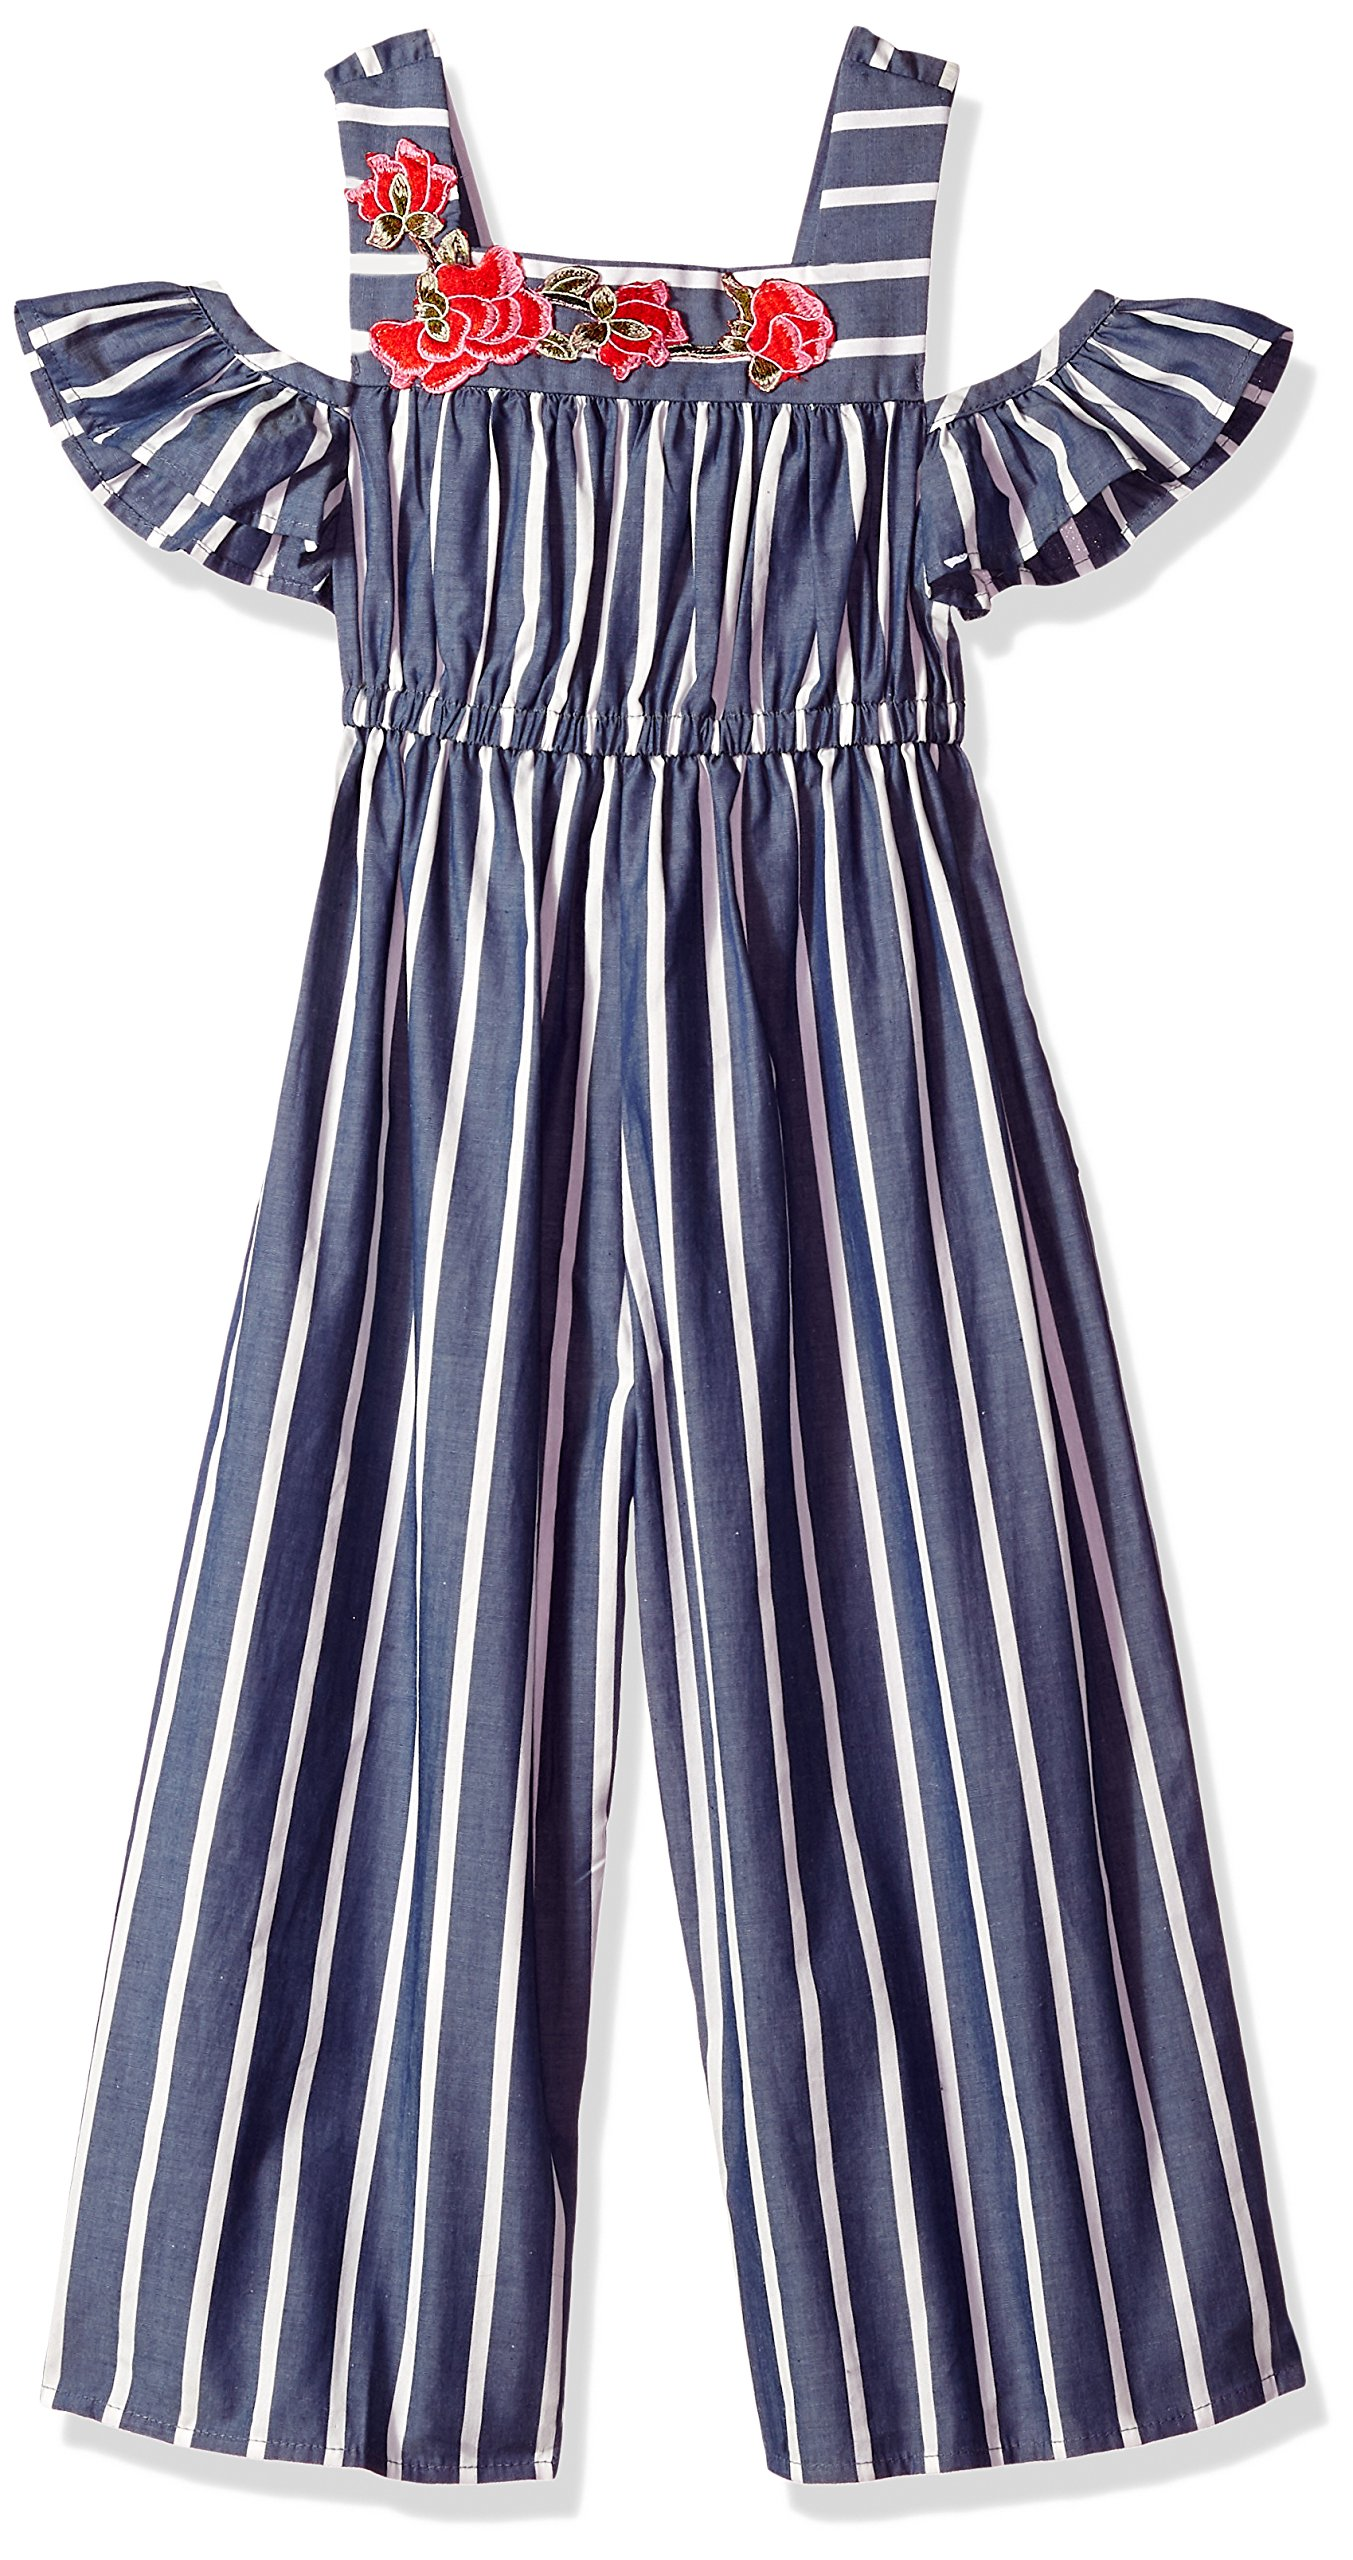 Bonnie Jean Big Girls' Jumpsuit, Blue Stripe, 10